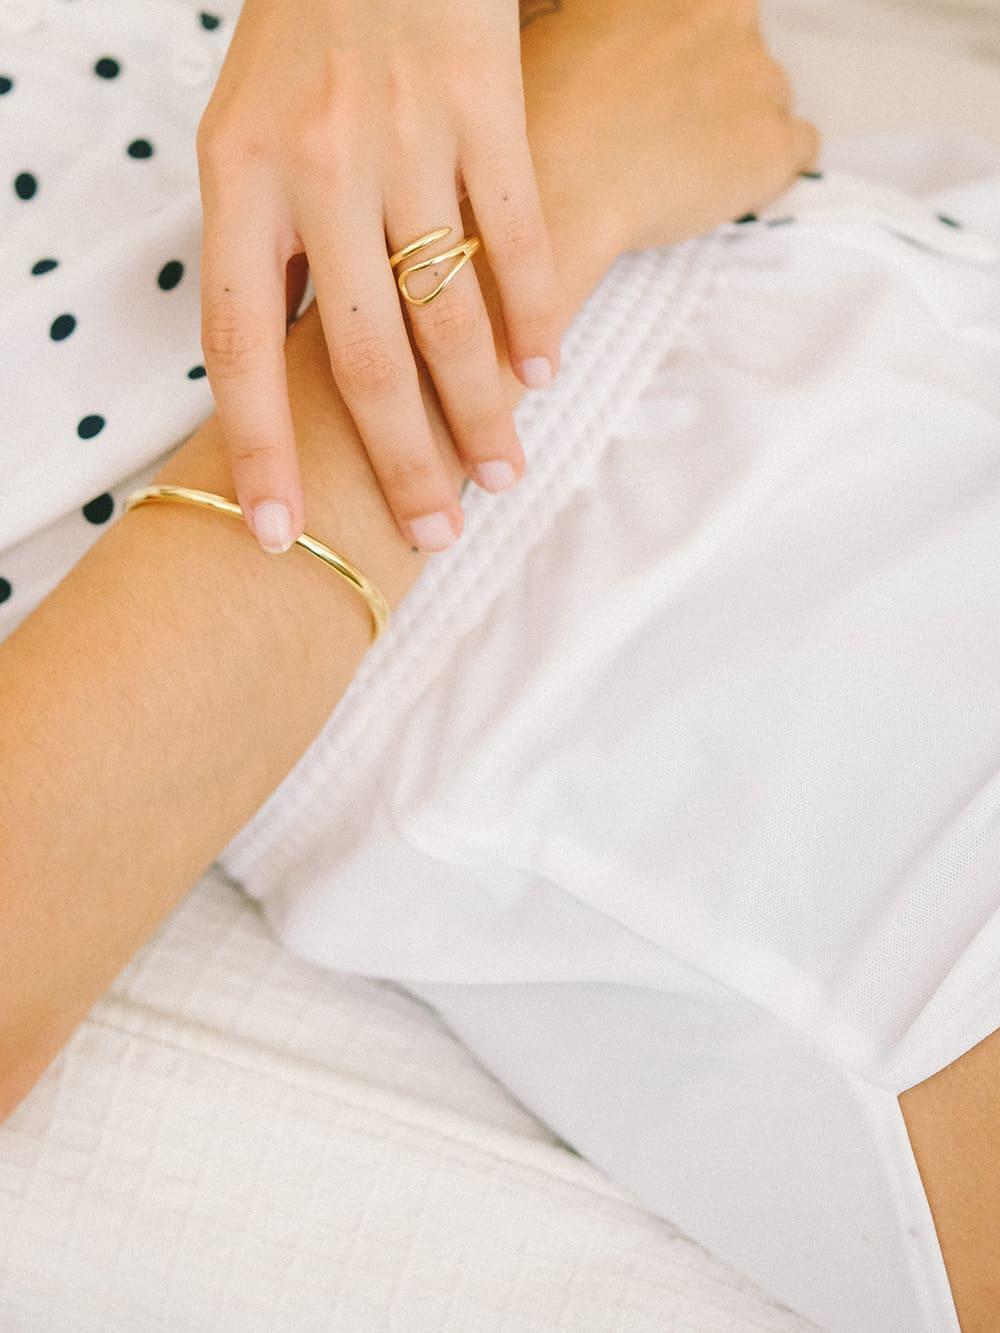 anillo de oro 18k para mjer con forma de aguja, joyas para regalar, anillos de plata para regalo, joyas marteliè barcelona, joyasmarket